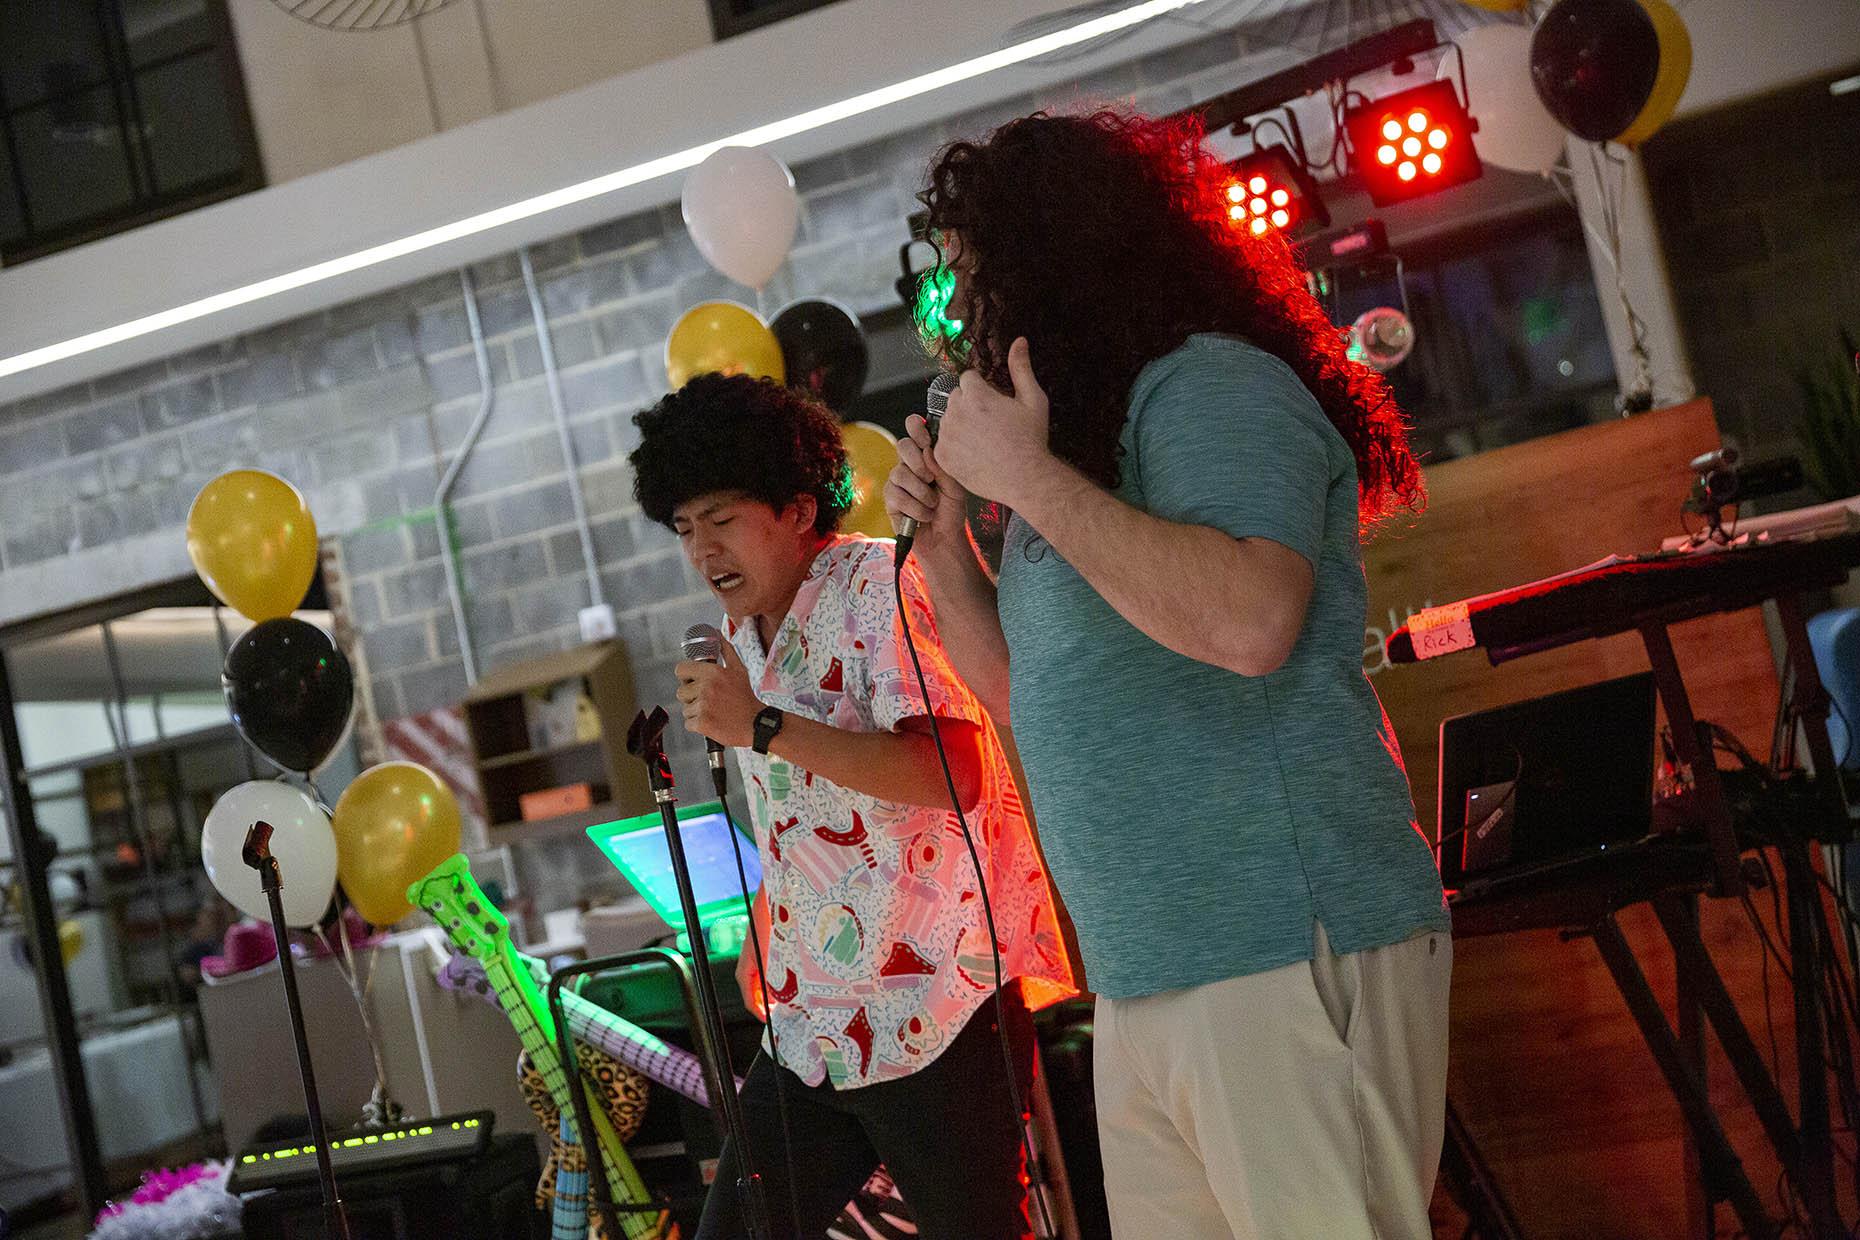 JRA_KaraokeEvent_03.06.19__3187-e_webuse.jpg